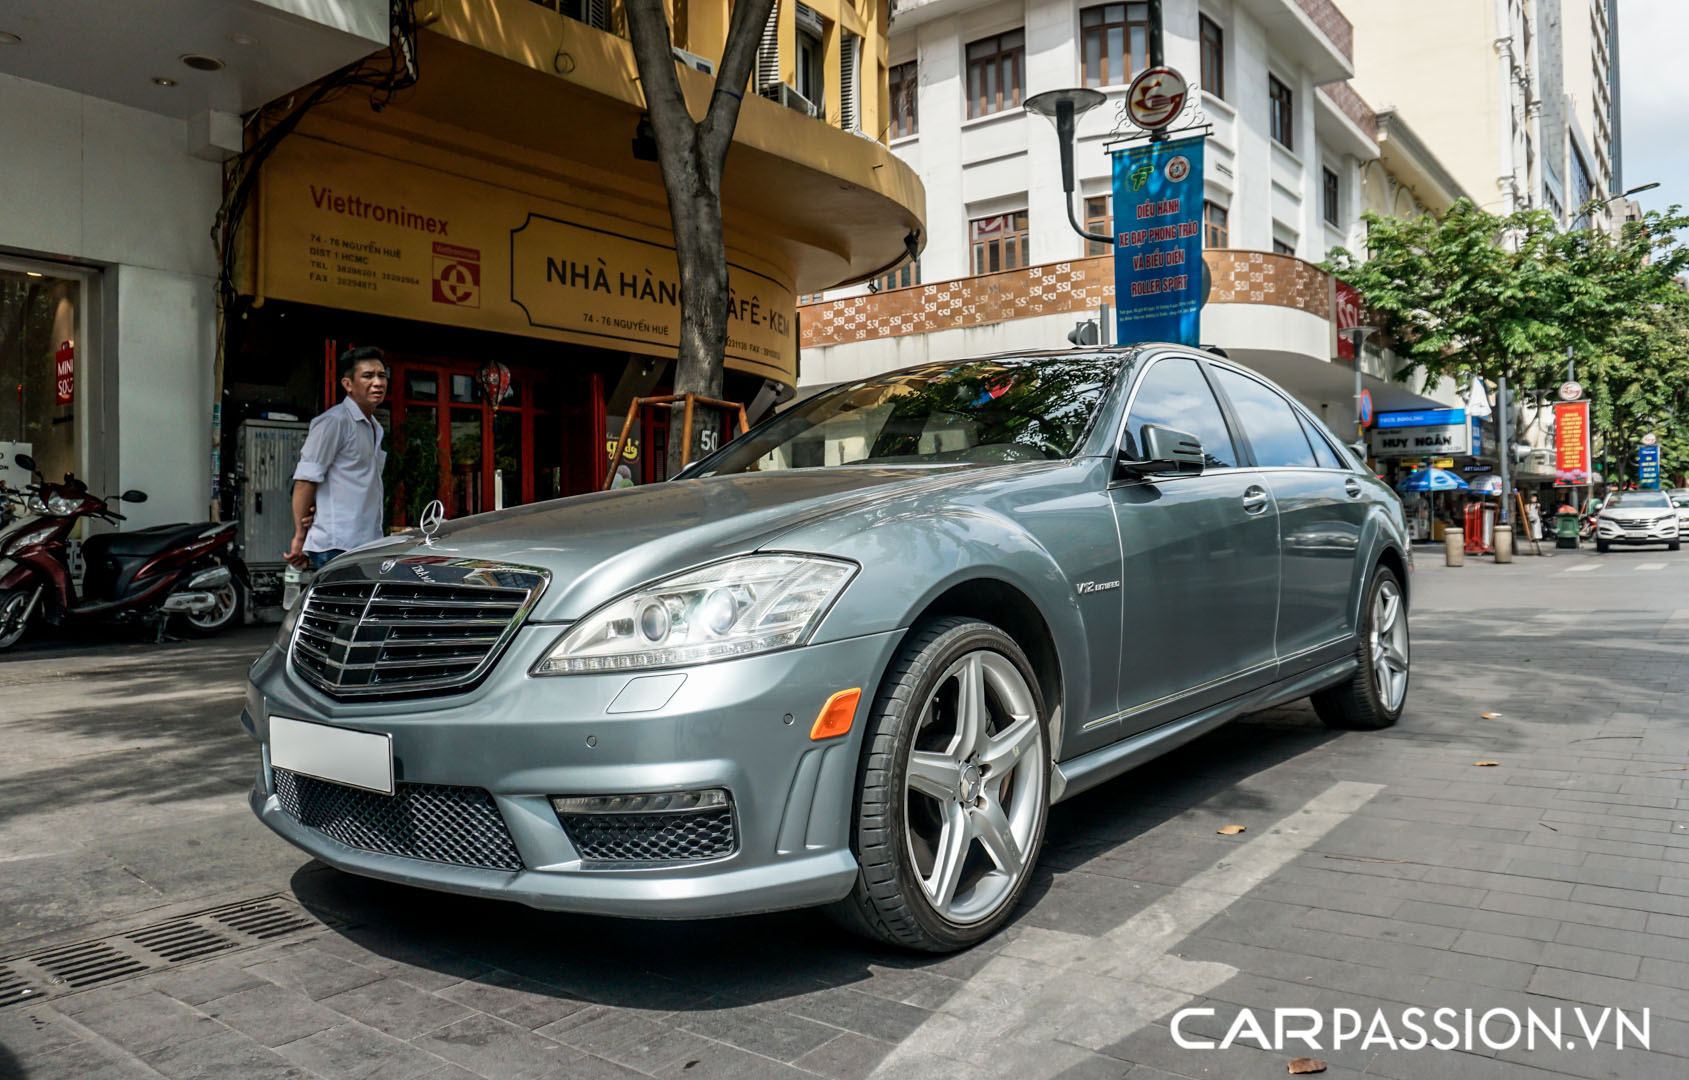 CP-Mercedes-Benz S65 AMG (7).jpg